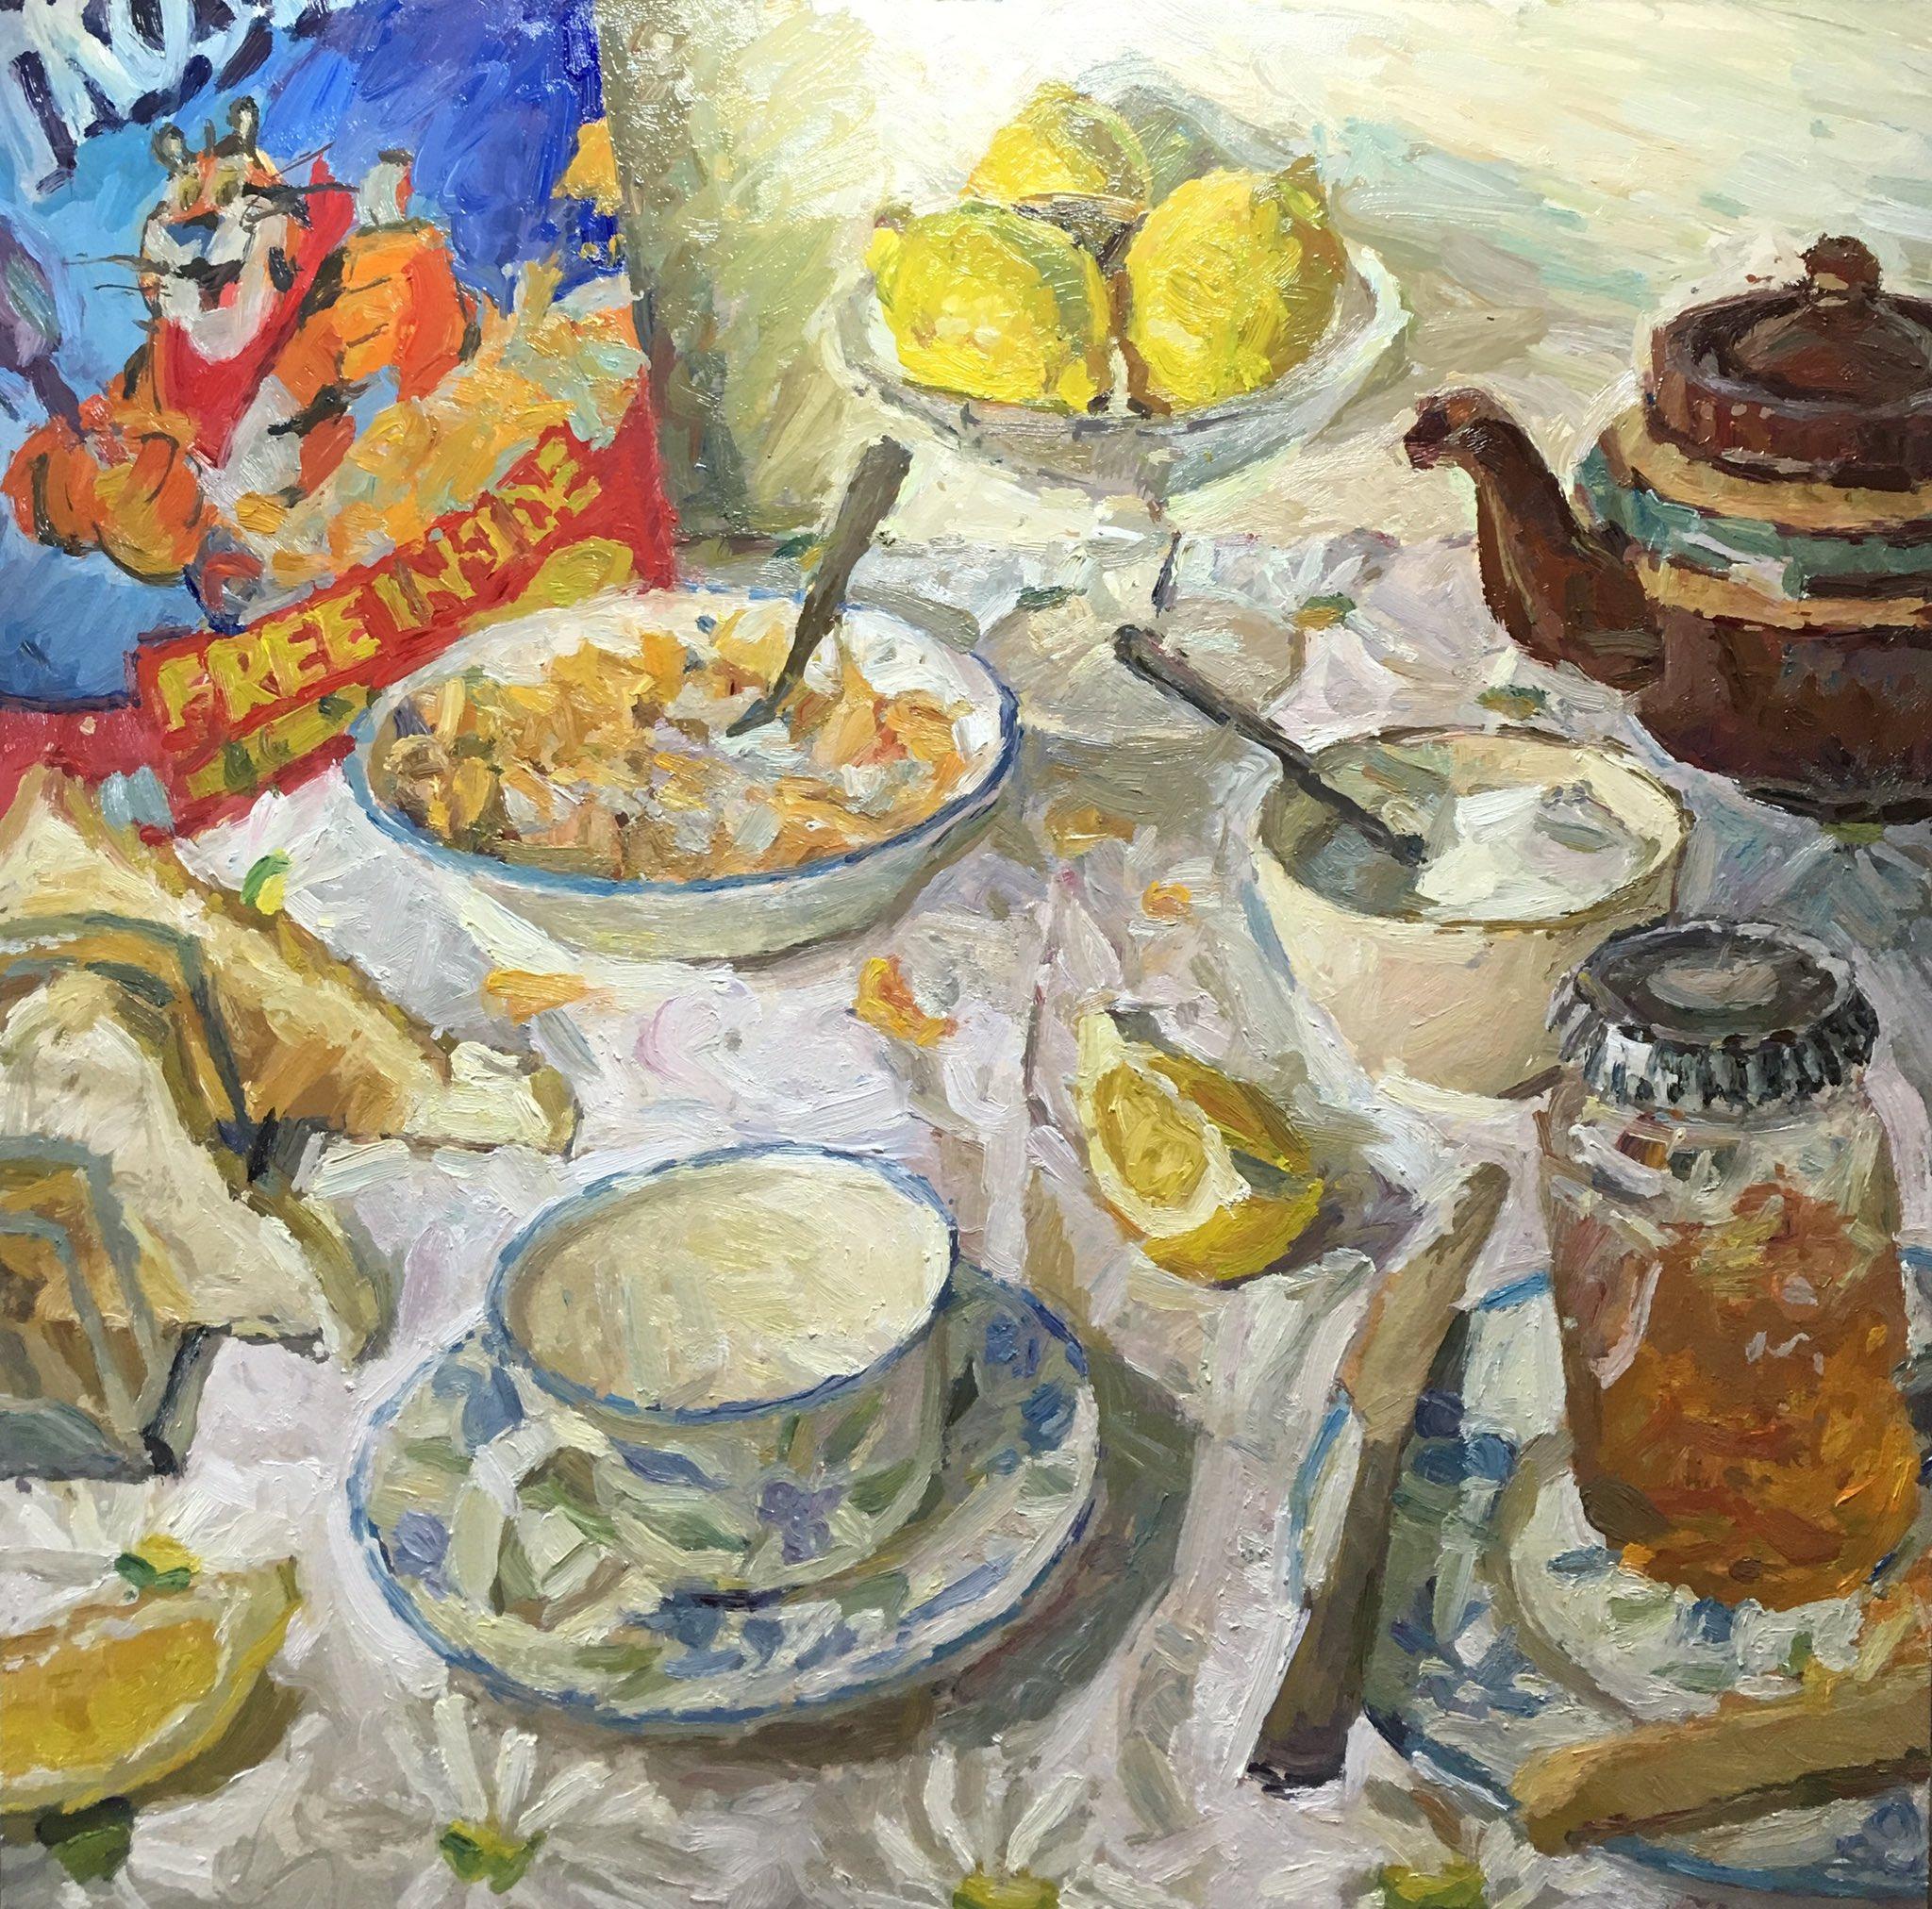 "Adam Ralston Artist on Twitter: ""12x12 #tonythetiger #frosties #cereal  #breakfast #lemons #adamralstonart #marmalade #teapot #stilllifepainting  #sugar #teaandtoast… https://t.co/xQyBVGAPdU"""